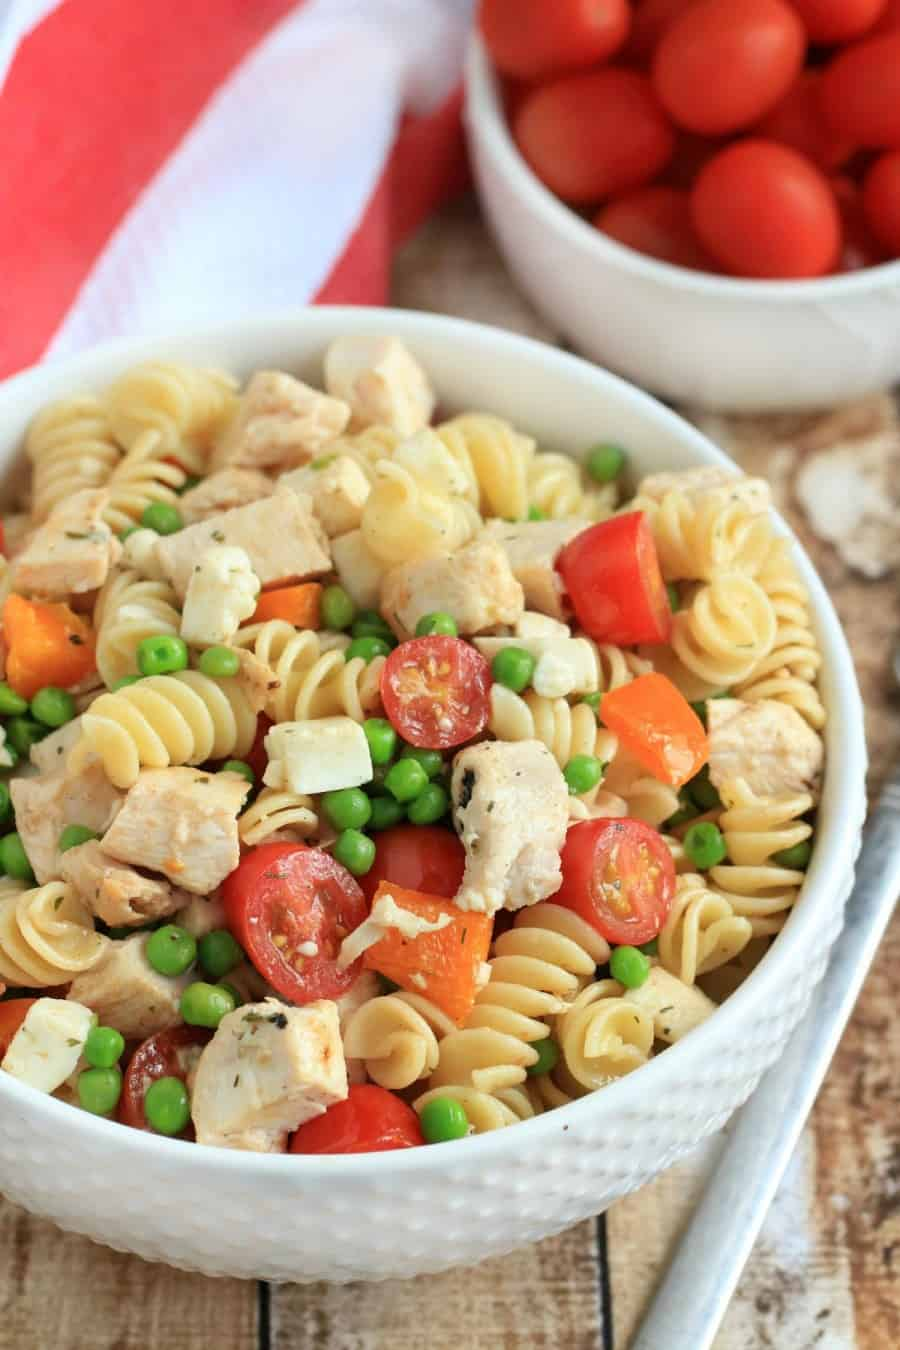 Chicken-and-Pea-Pasta-Salad-recipe1-900x1350